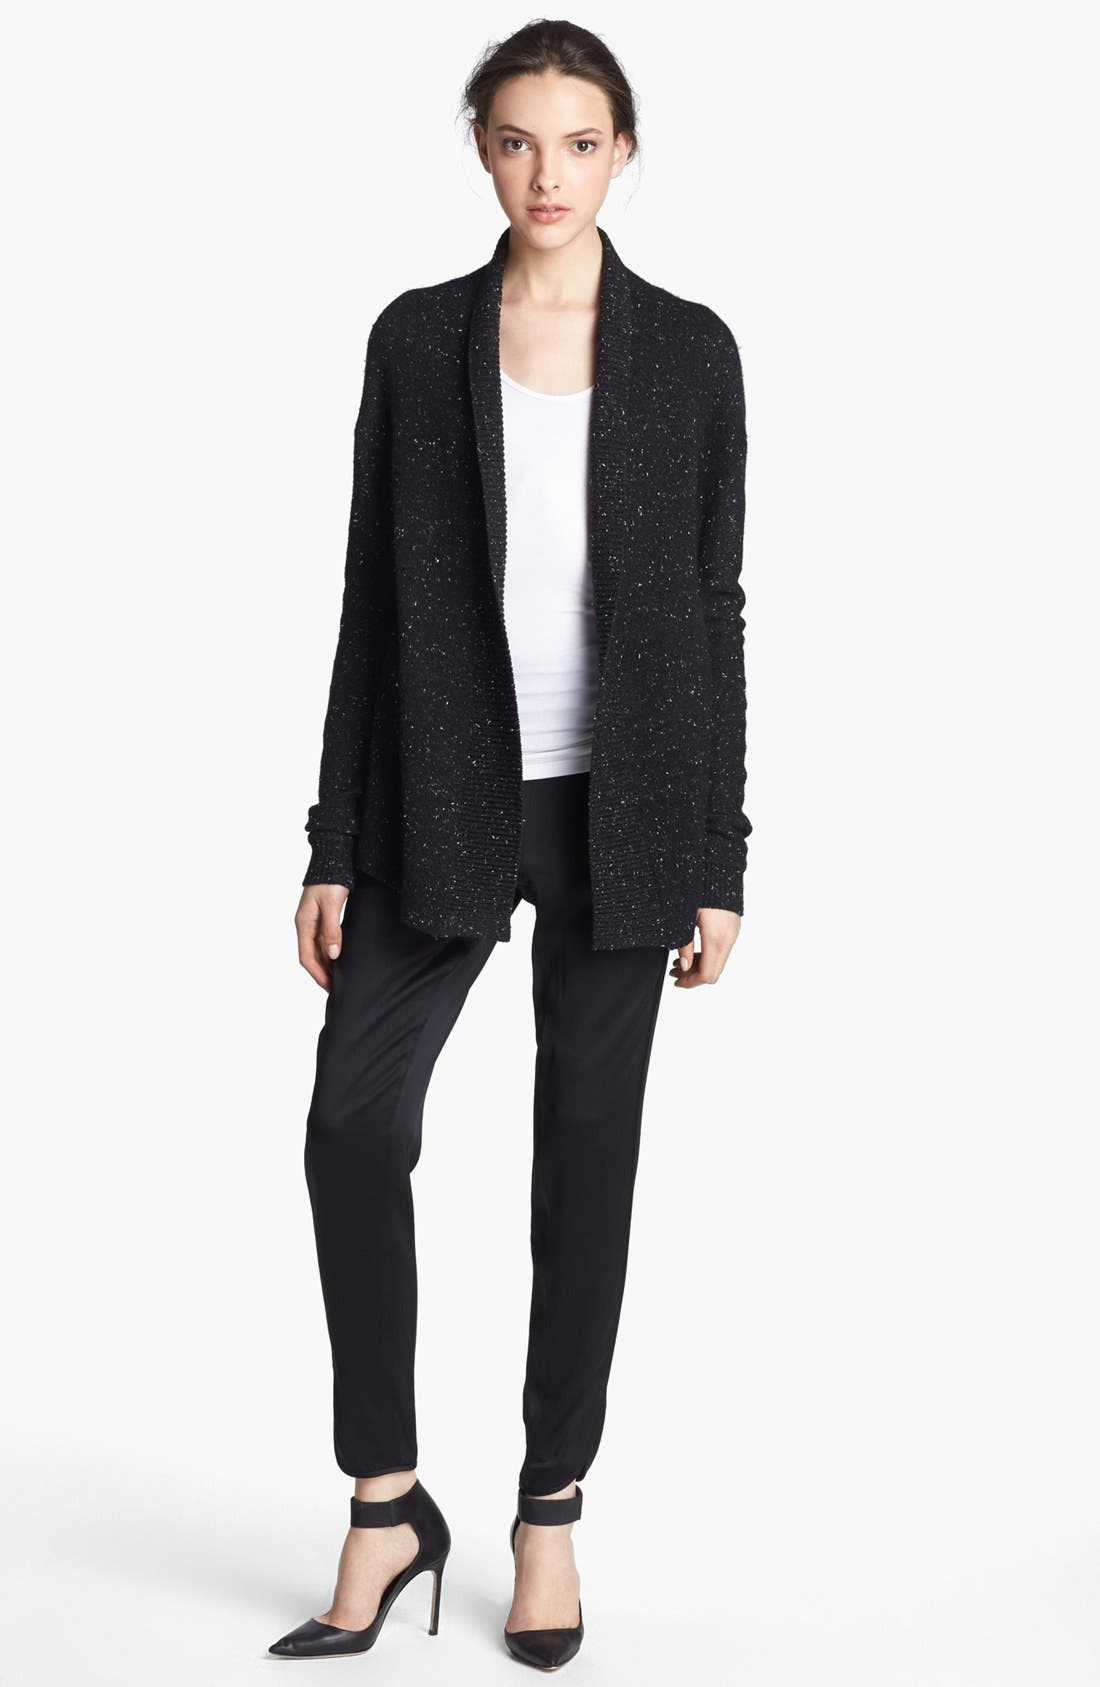 Alternate Image 1 Selected - Alexander Wang Donegal Tweed Knit Cardigan